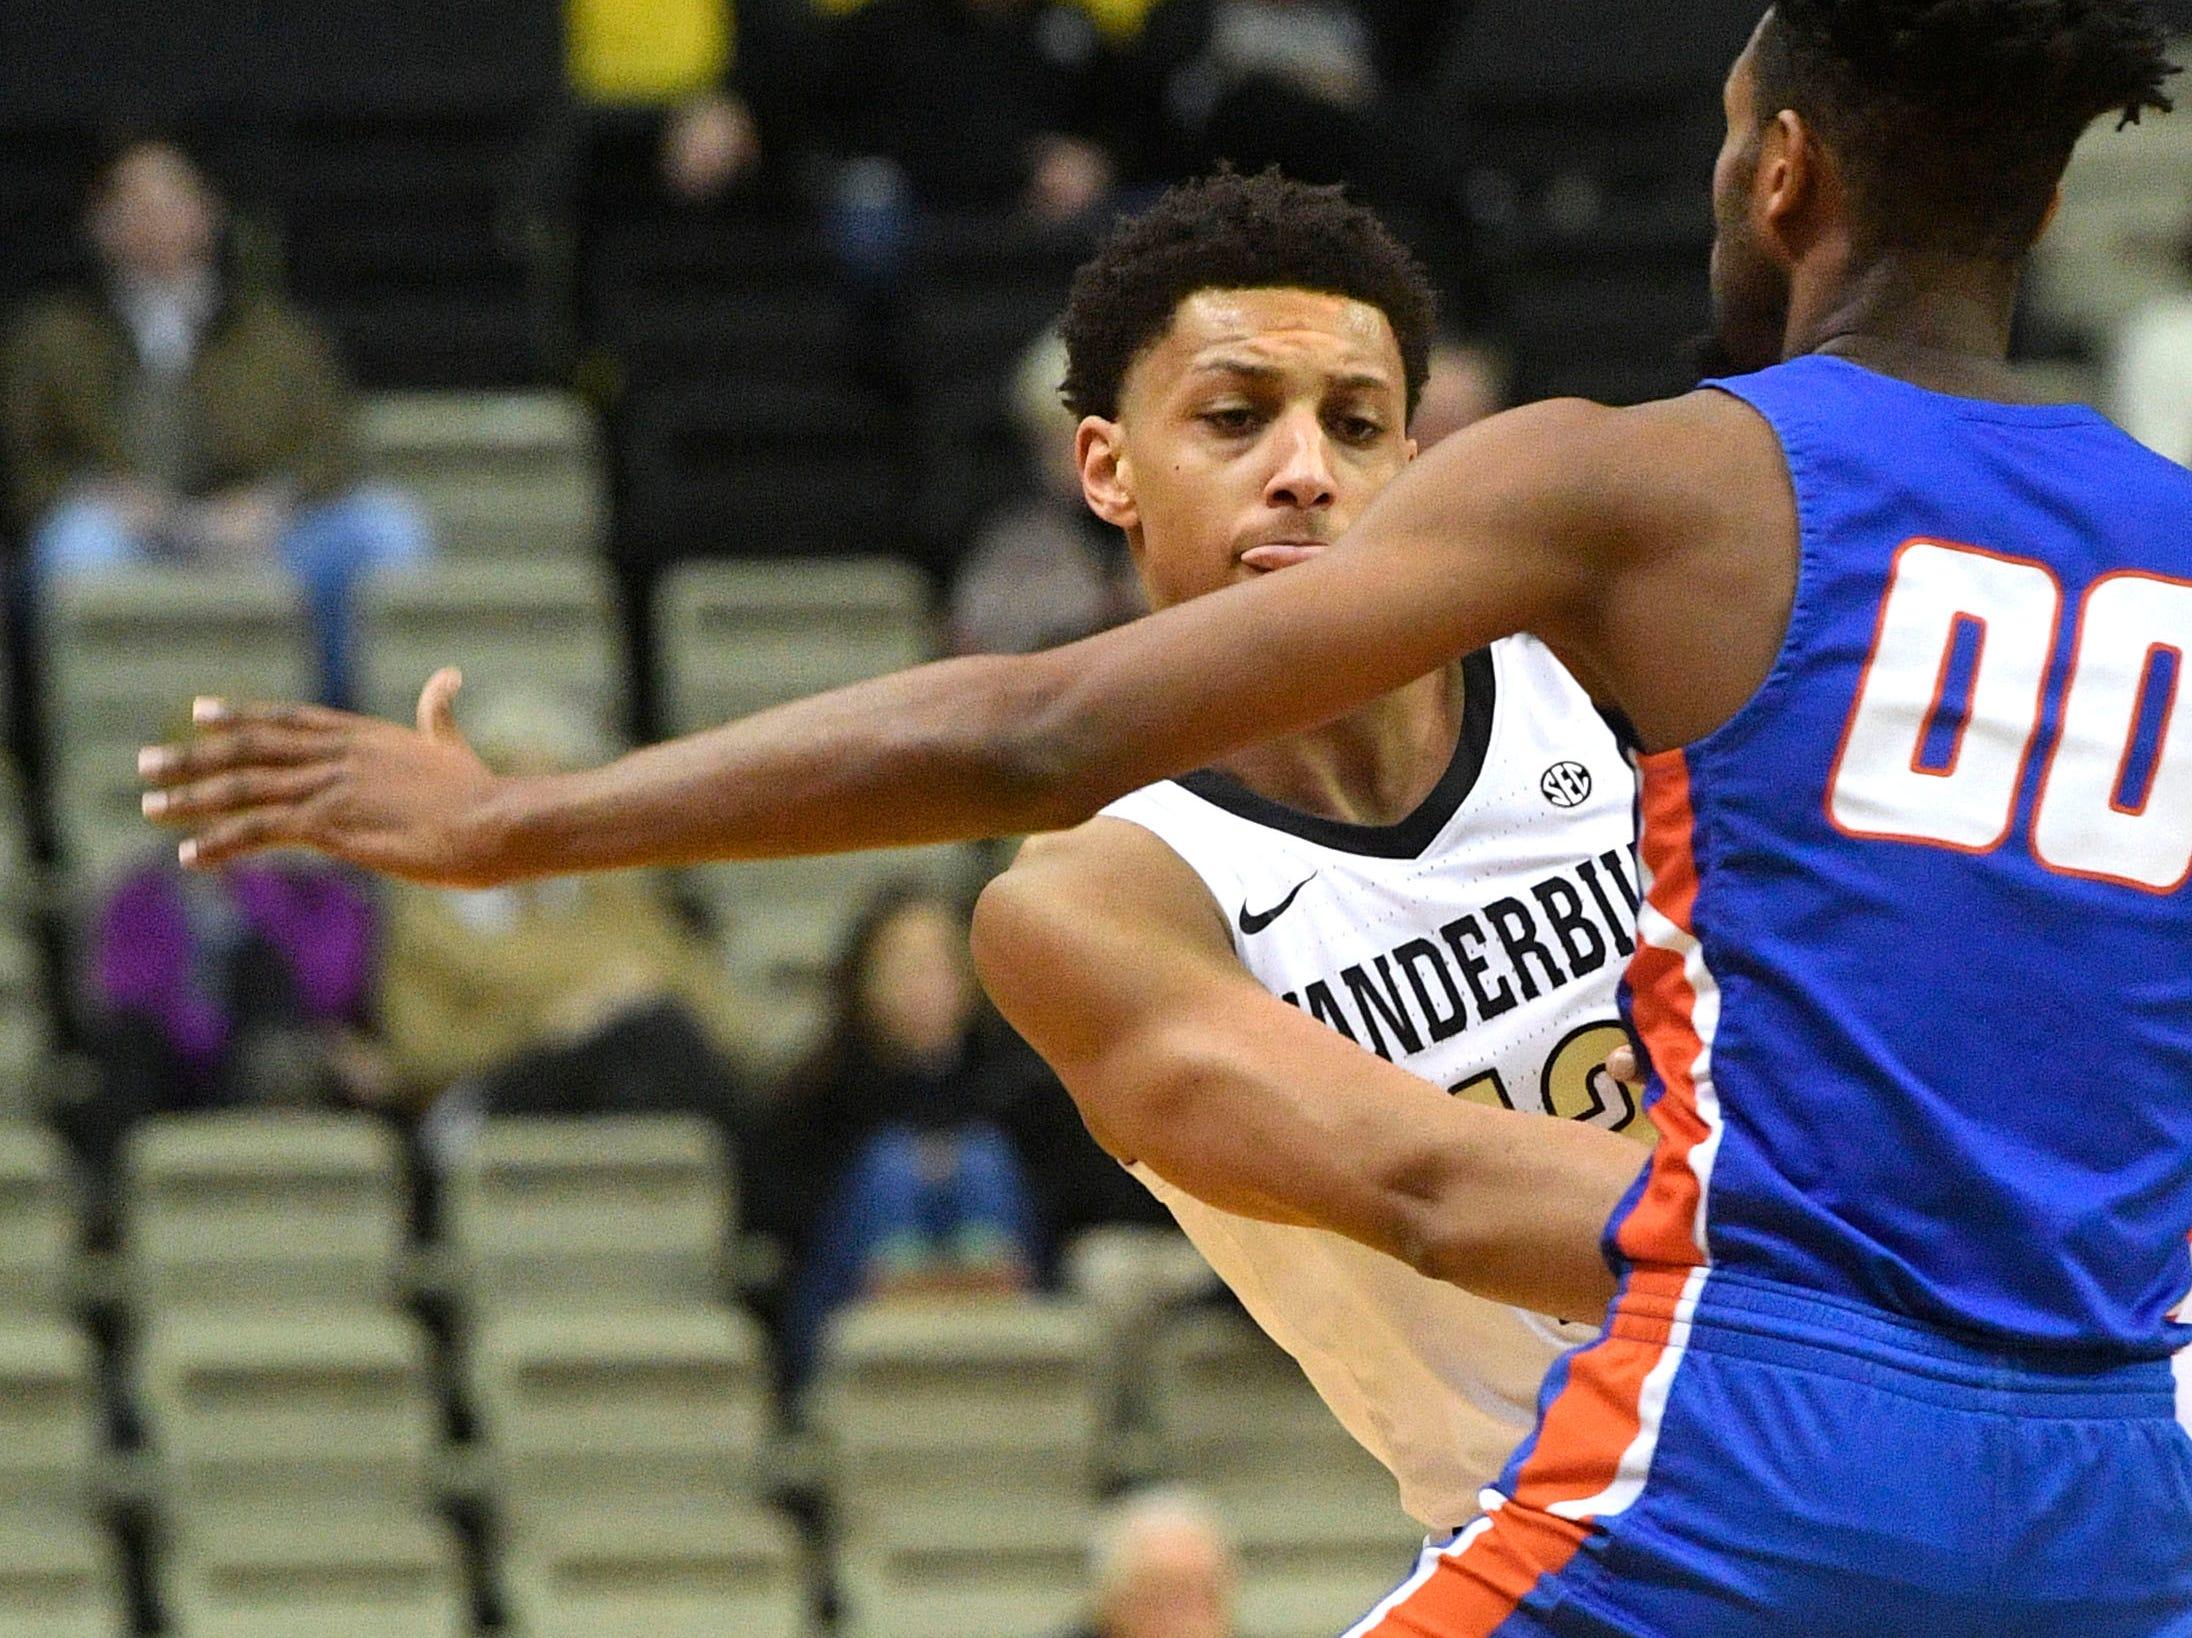 Vanderbilt Commodores forward Matthew Moyer (13) weaves a pass to teammate as Vanderbilt plays Savannah State at Memorial Gym Tuesday Nov. 27, 2018, in Nashville, Tenn.